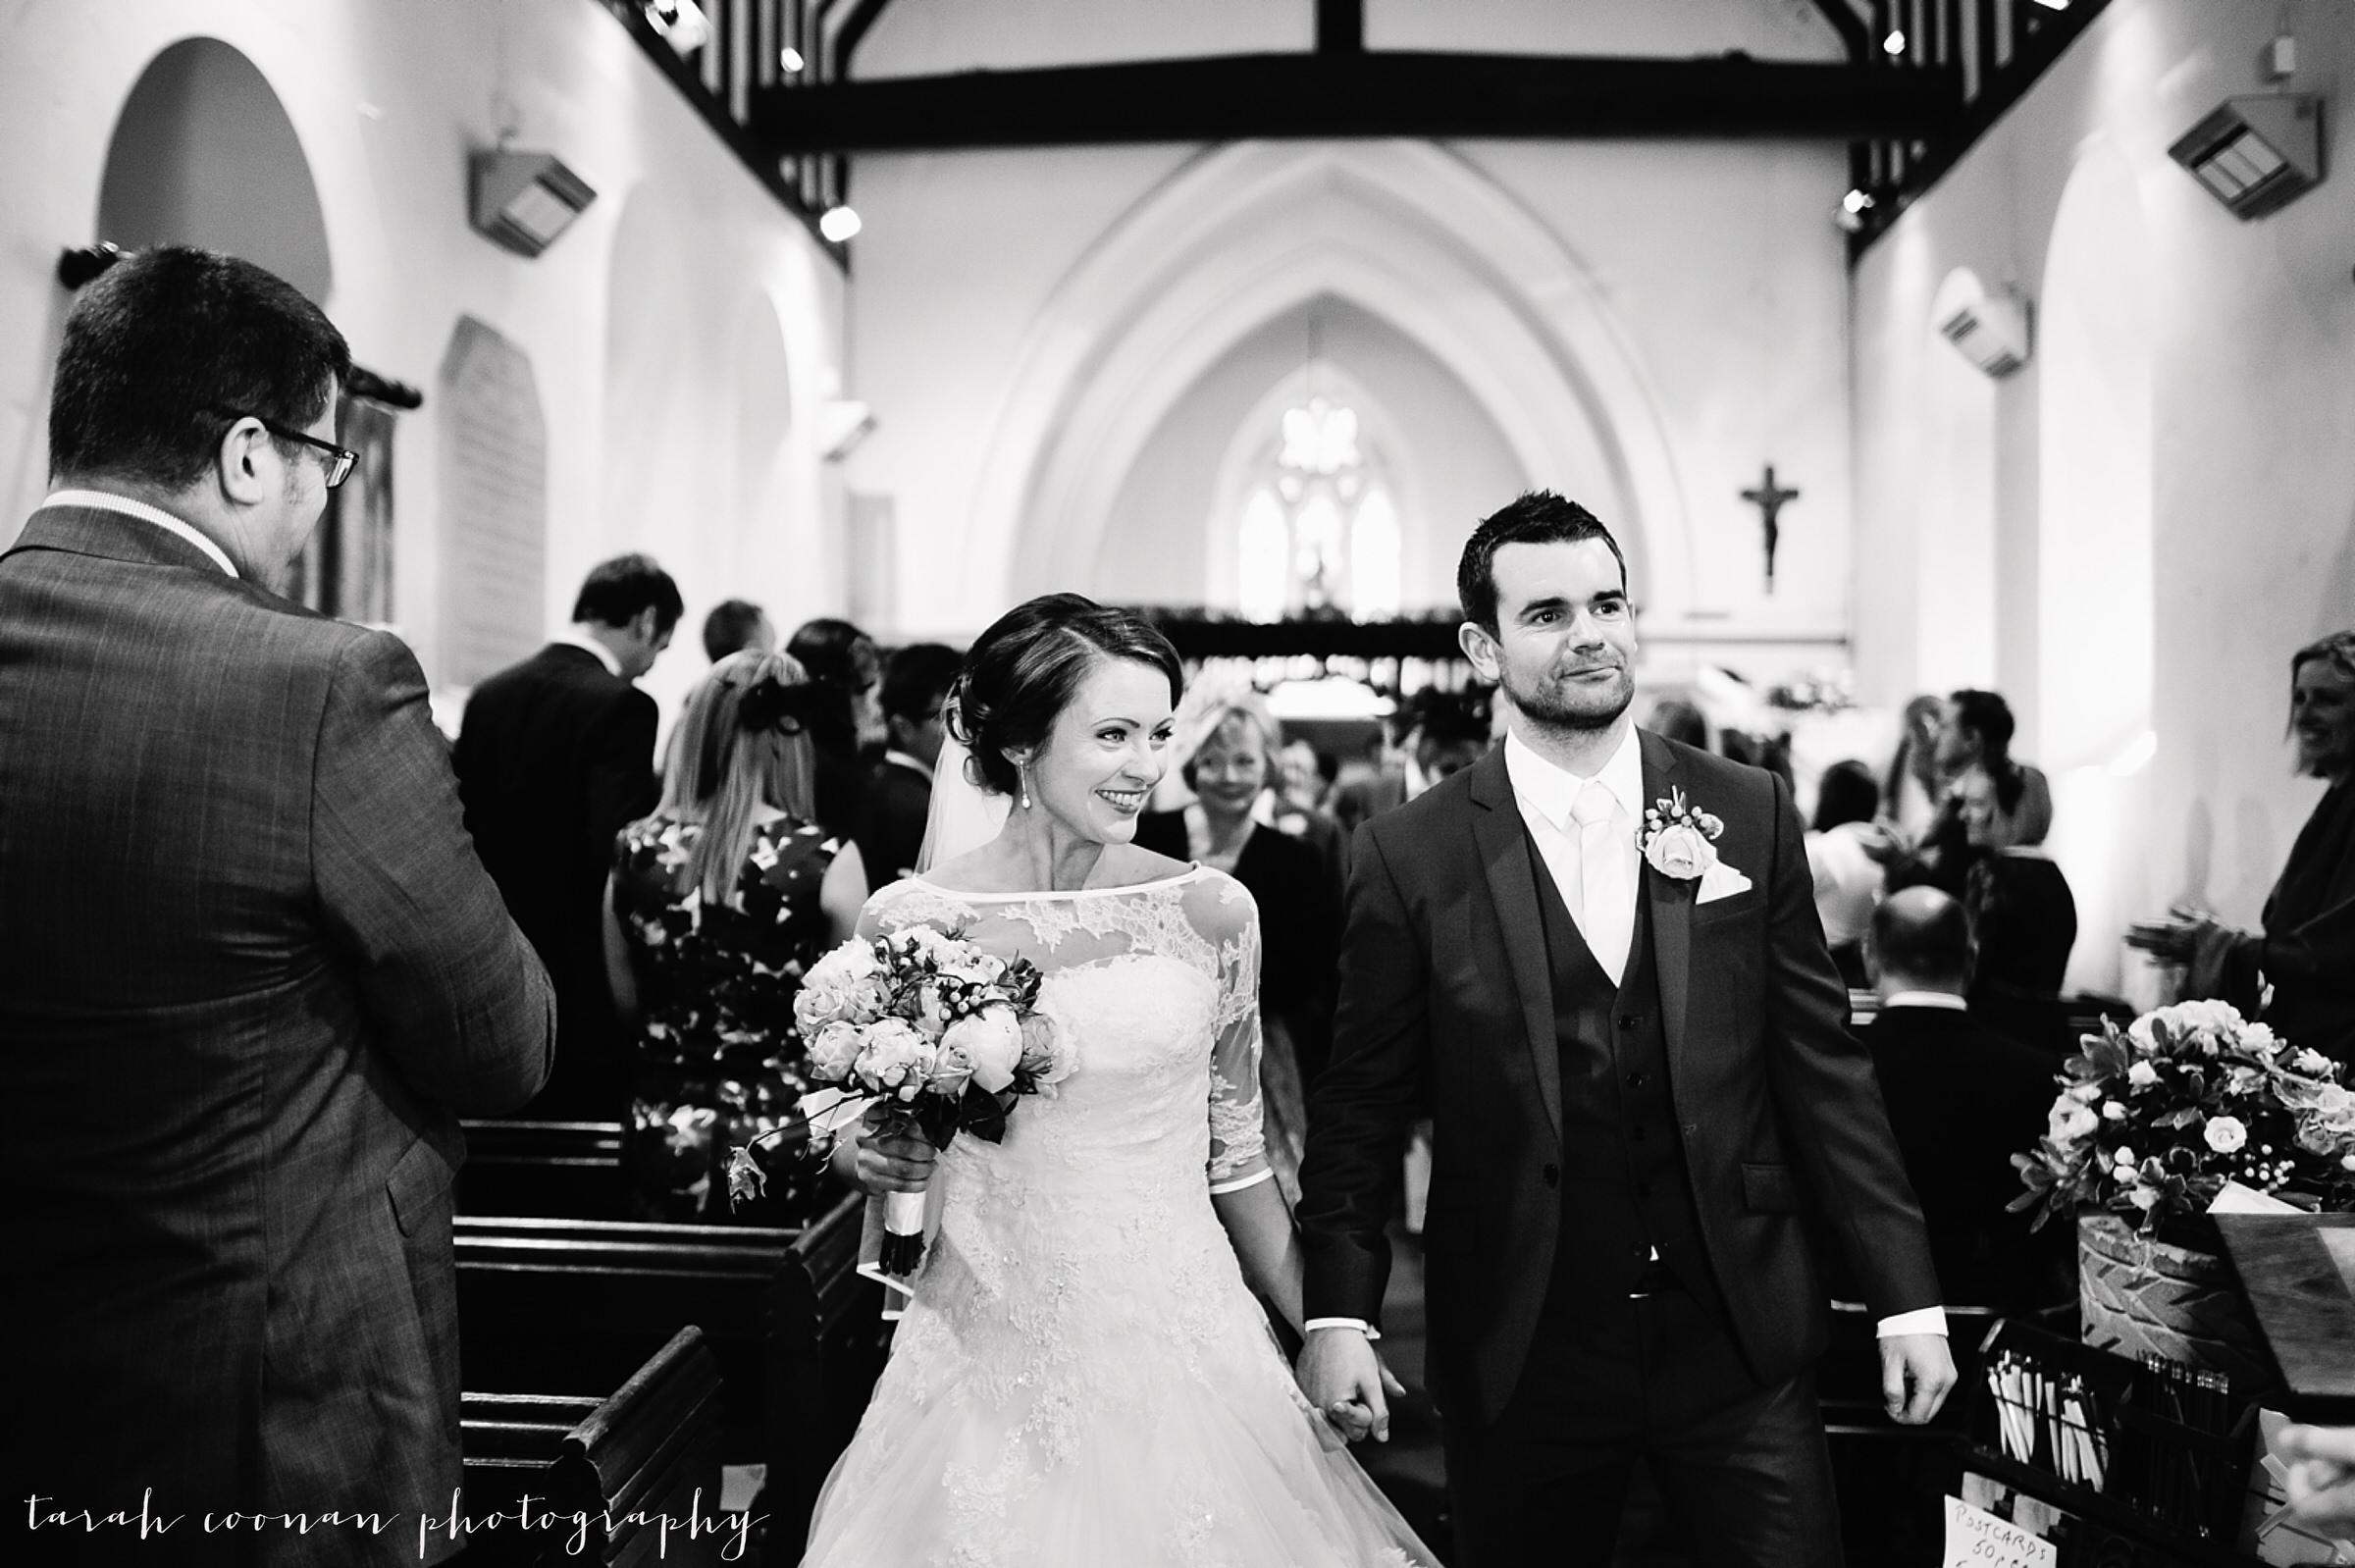 northbrook-park-wedding-photographer_038